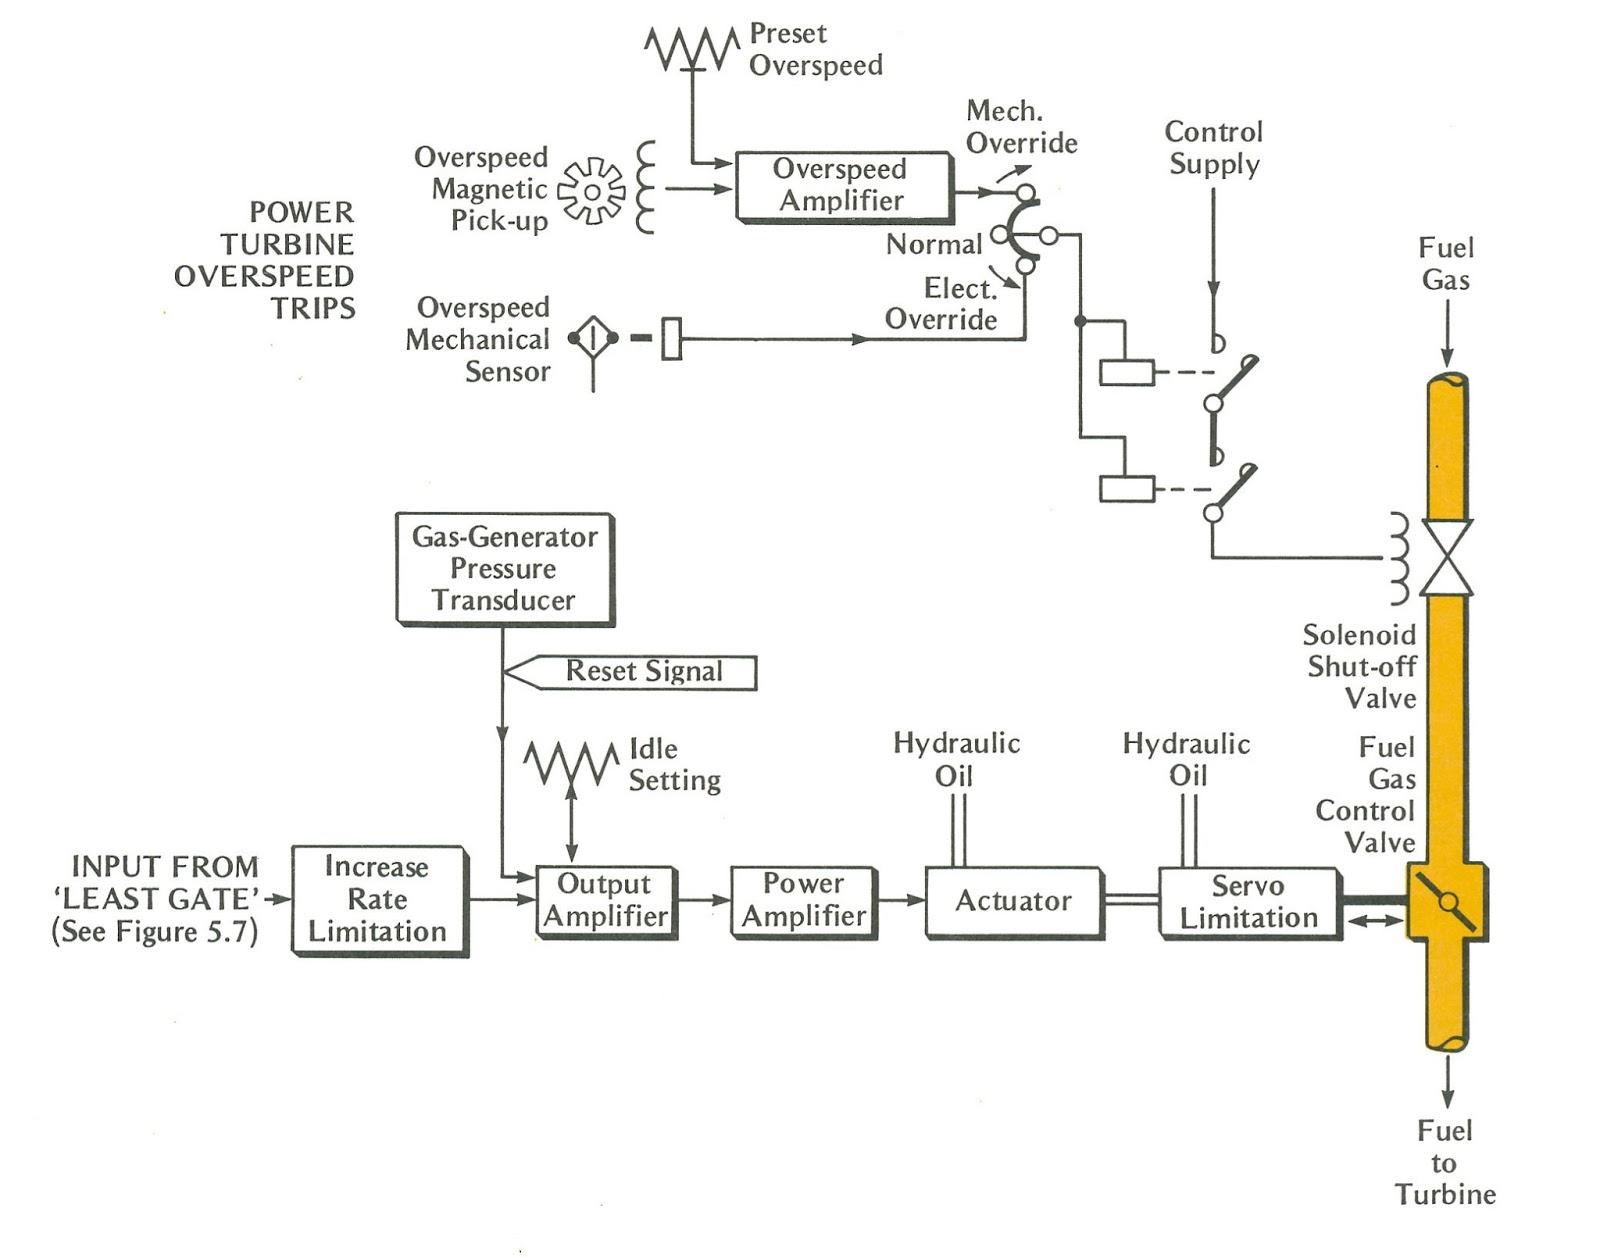 medium resolution of wiring diagram for steam iron wiring diagram wiring diagram for steam iron